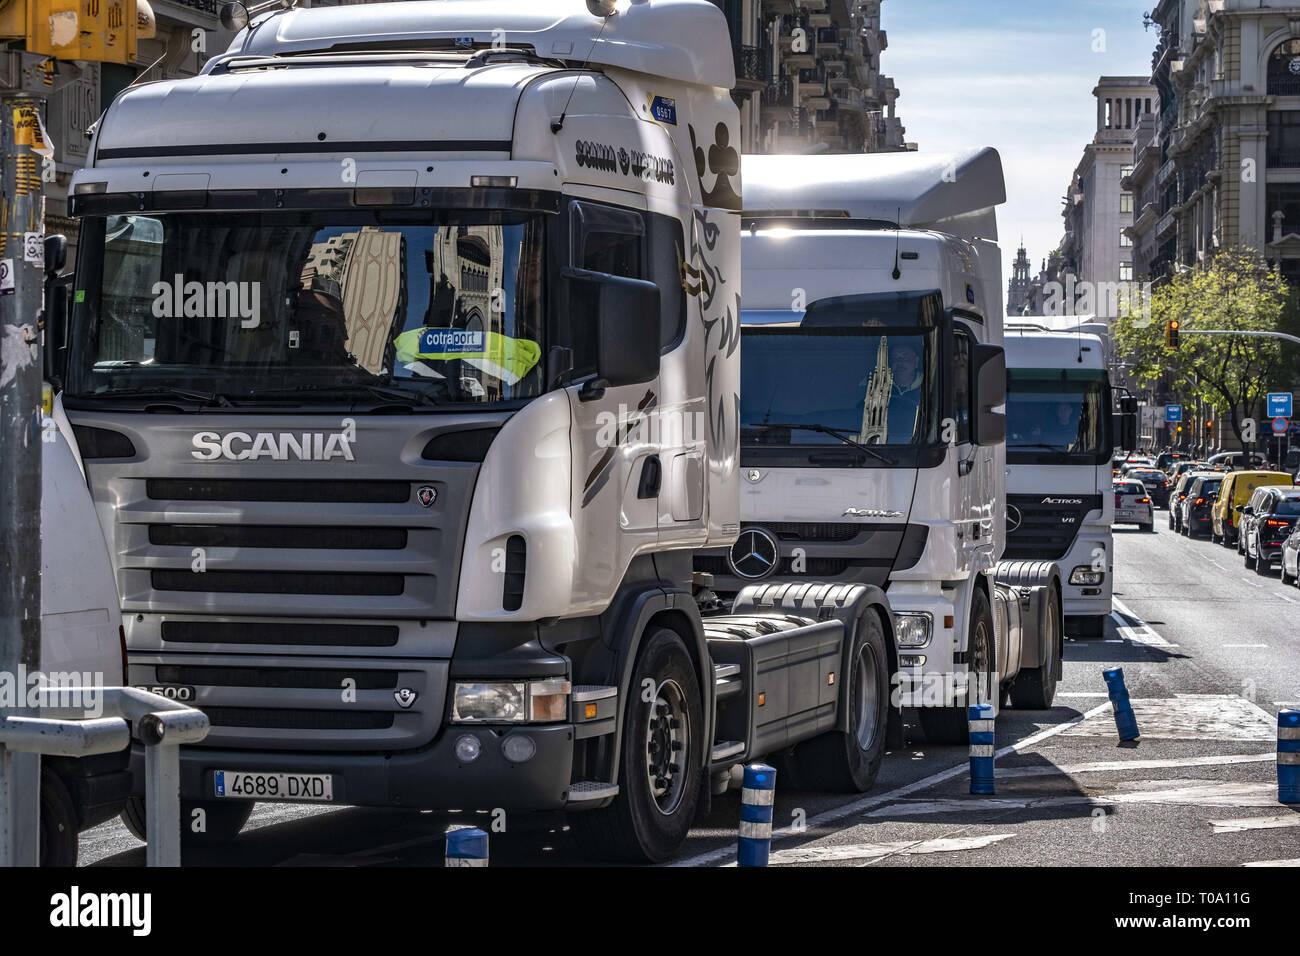 Barcelona, Spain  18th Mar 2019  A long line of trucks is